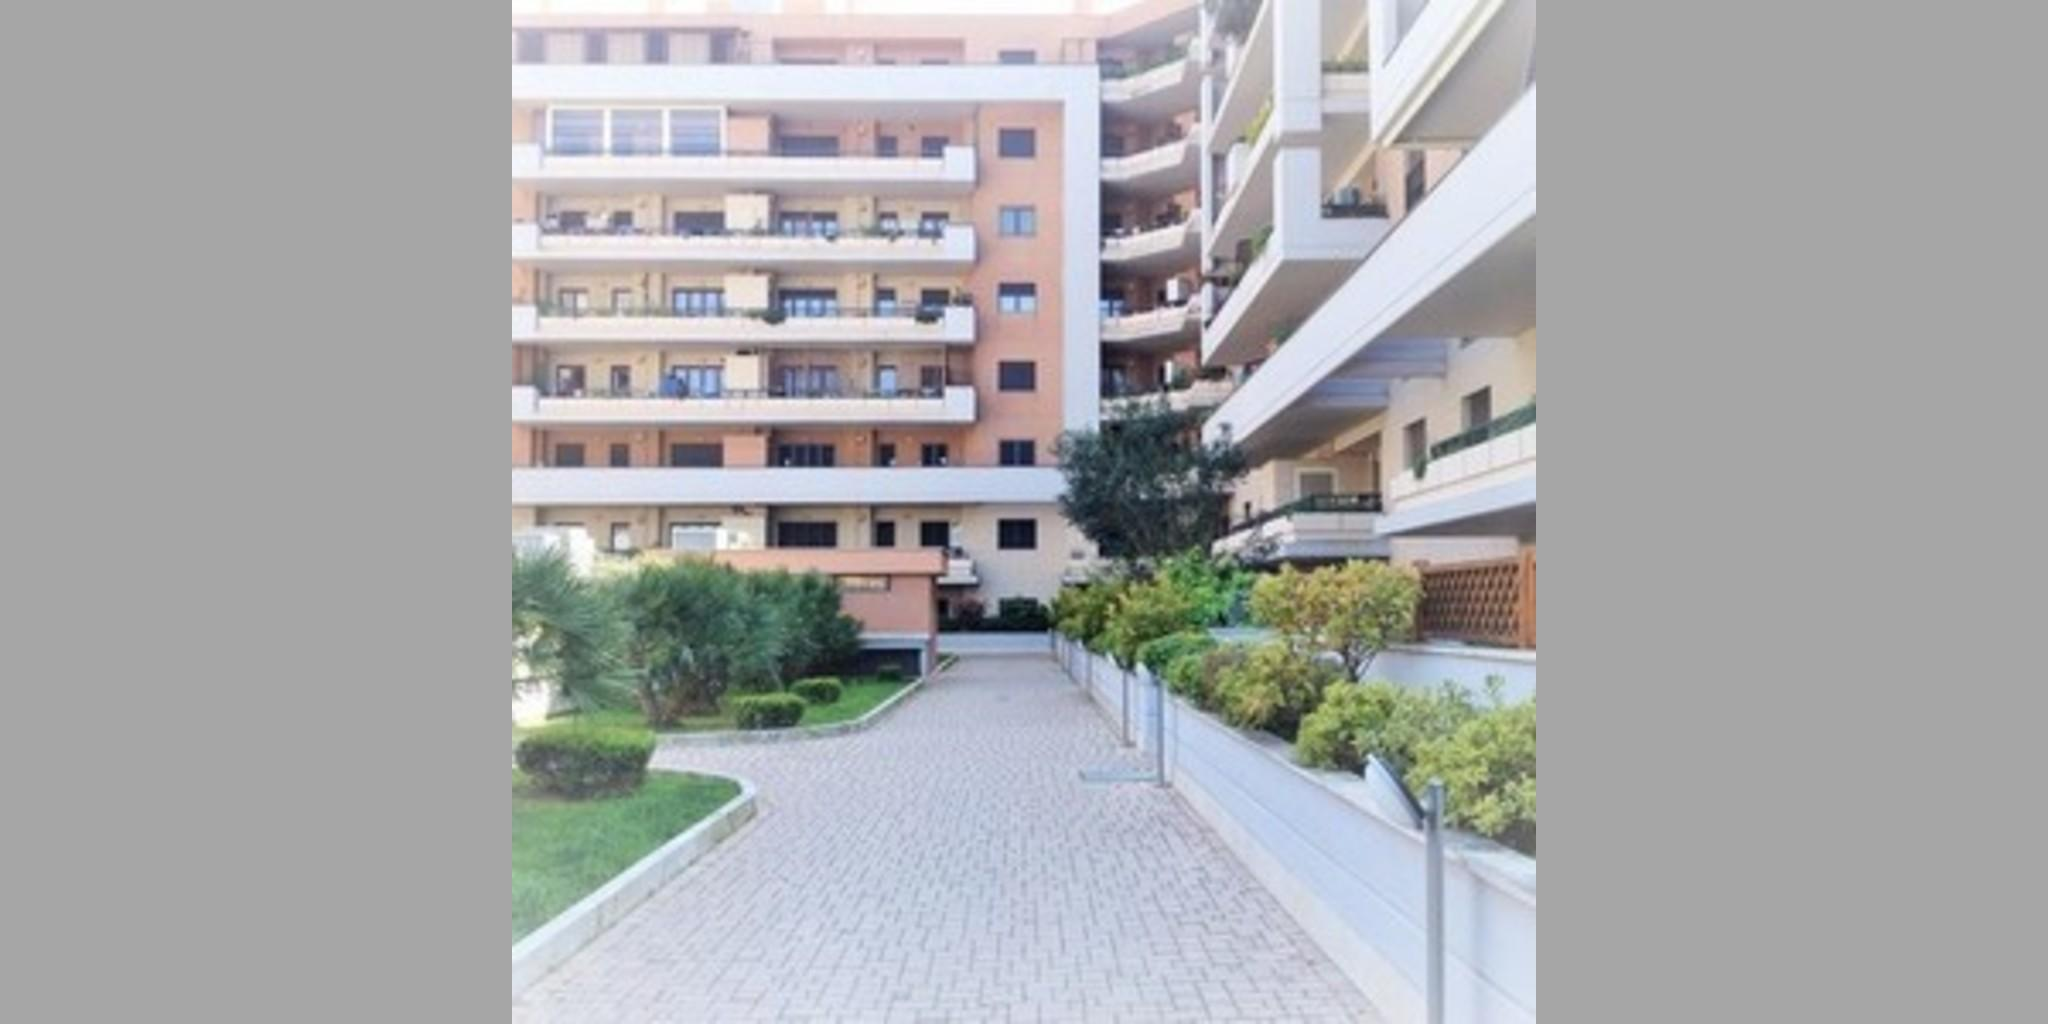 Appartement Fiumicino - Parco Leonardo